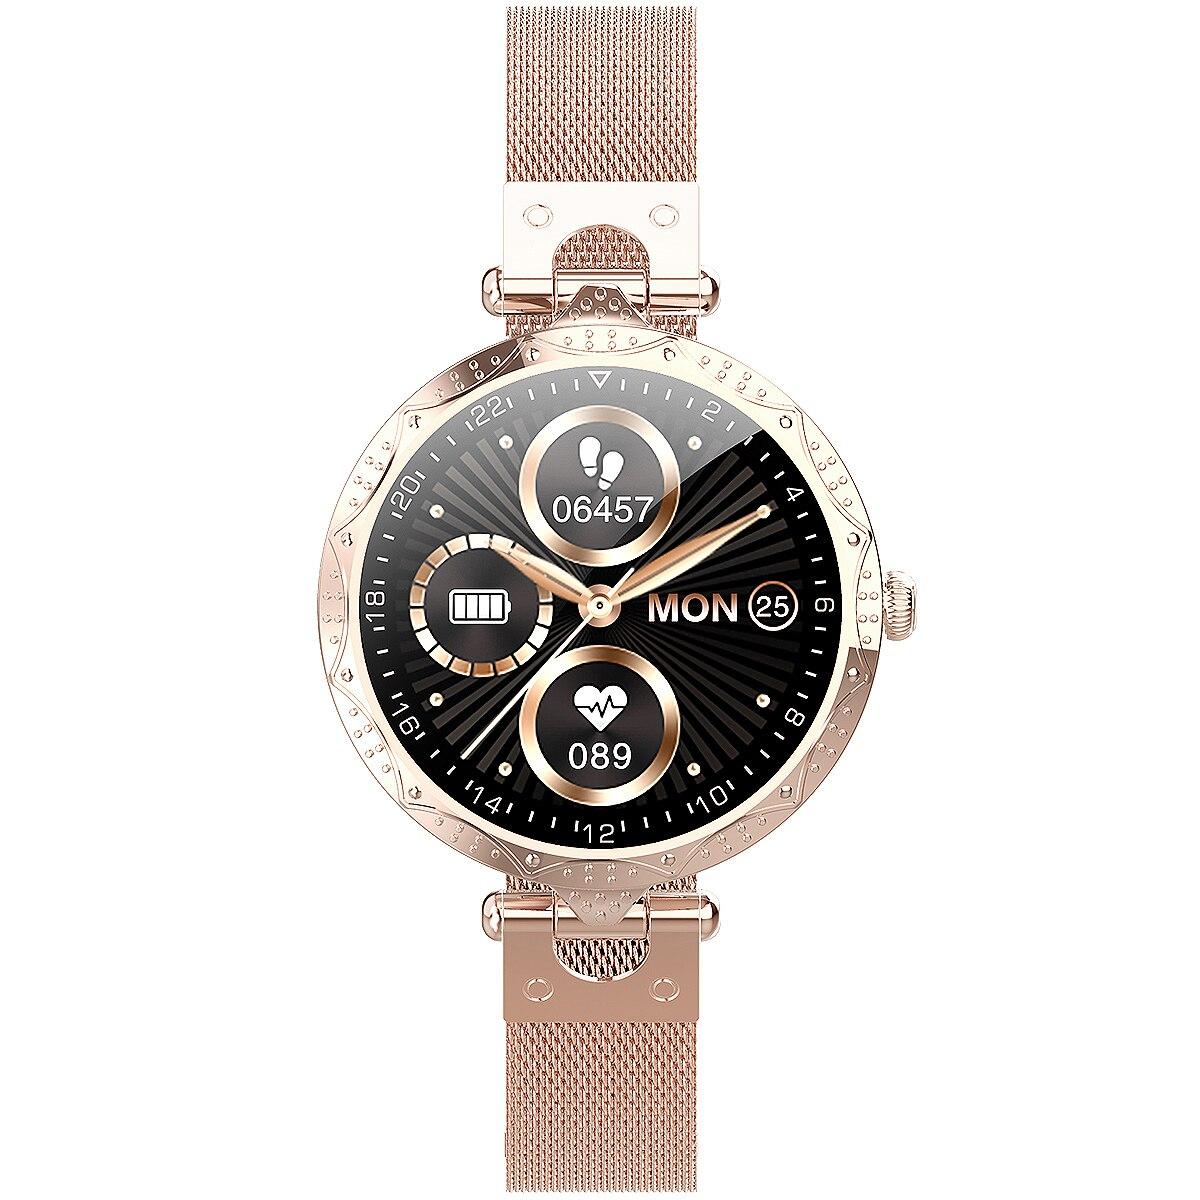 New AK22 Women's Smart Watch, Full Touch, Large Screen, Full Female Health Monitoring, IP68 Waterpro